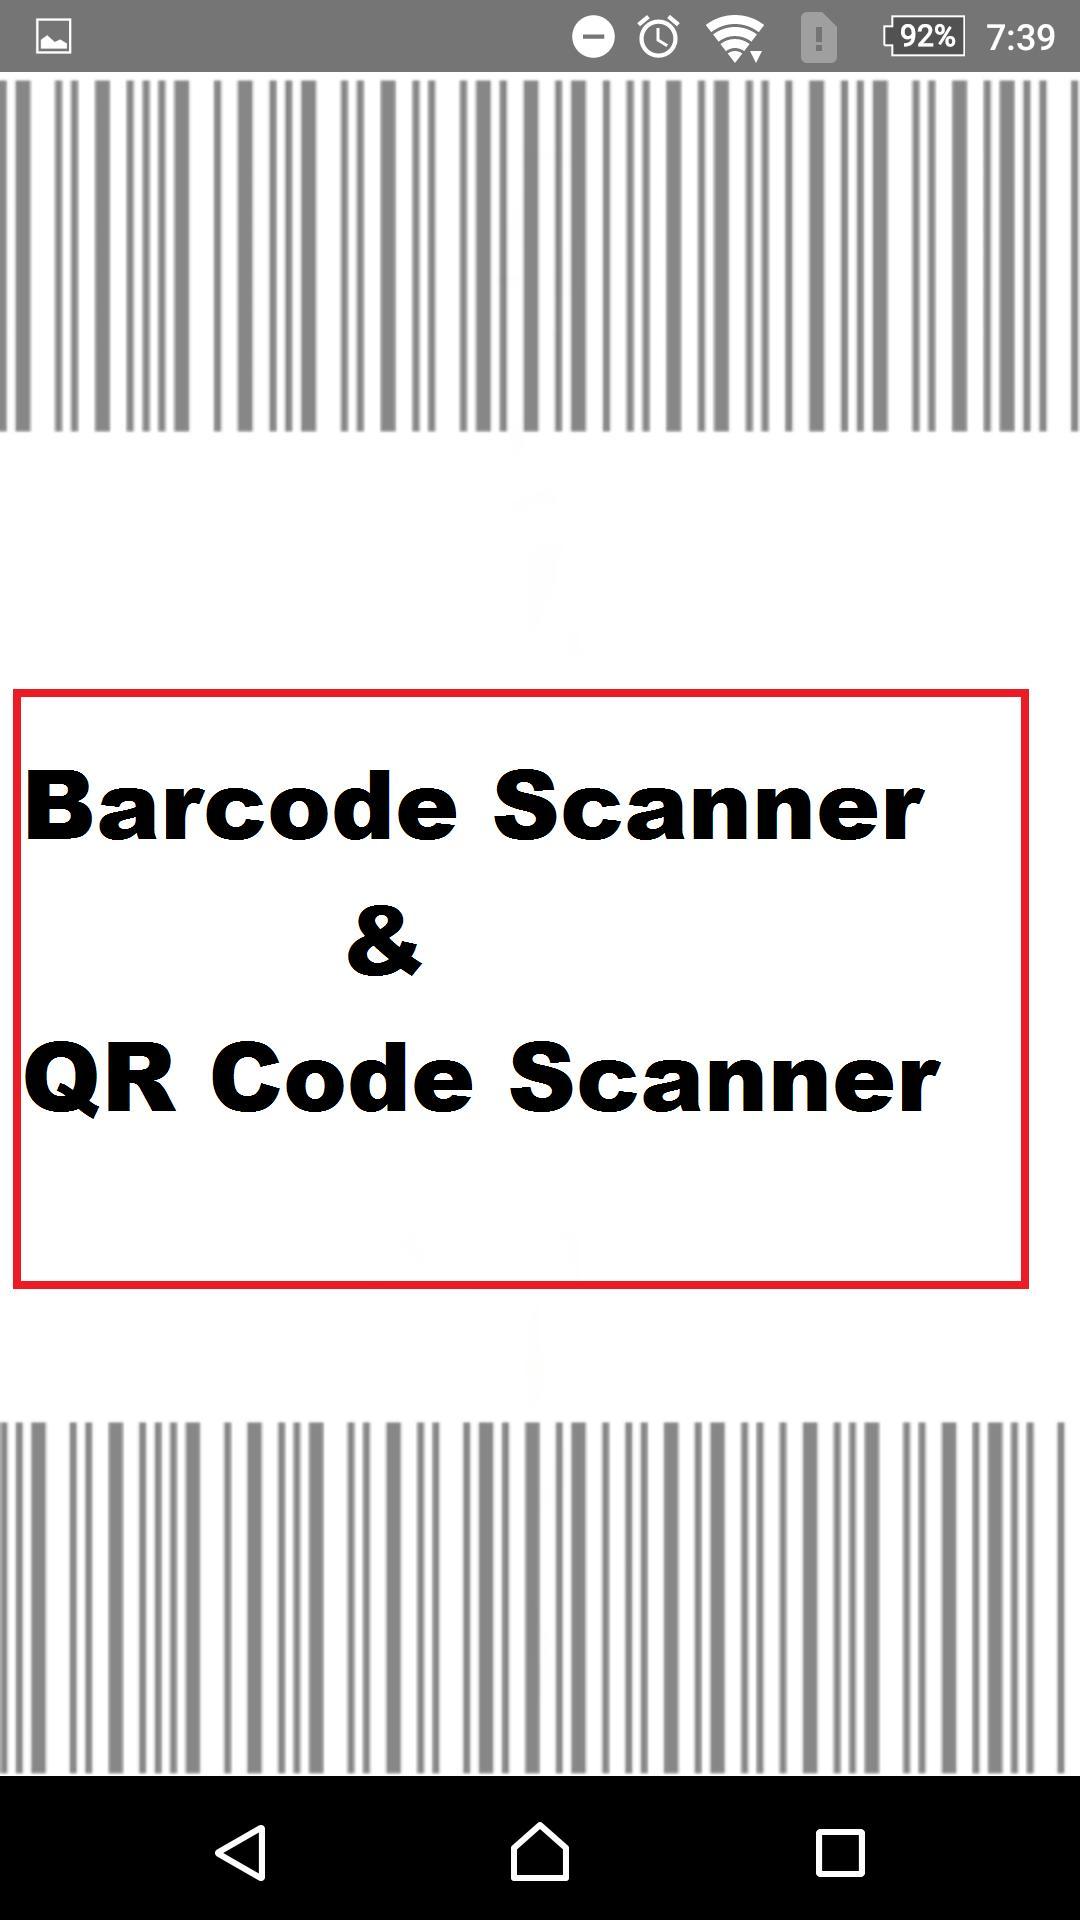 QR Code Scanner online & Barcode Scanner for Android - APK